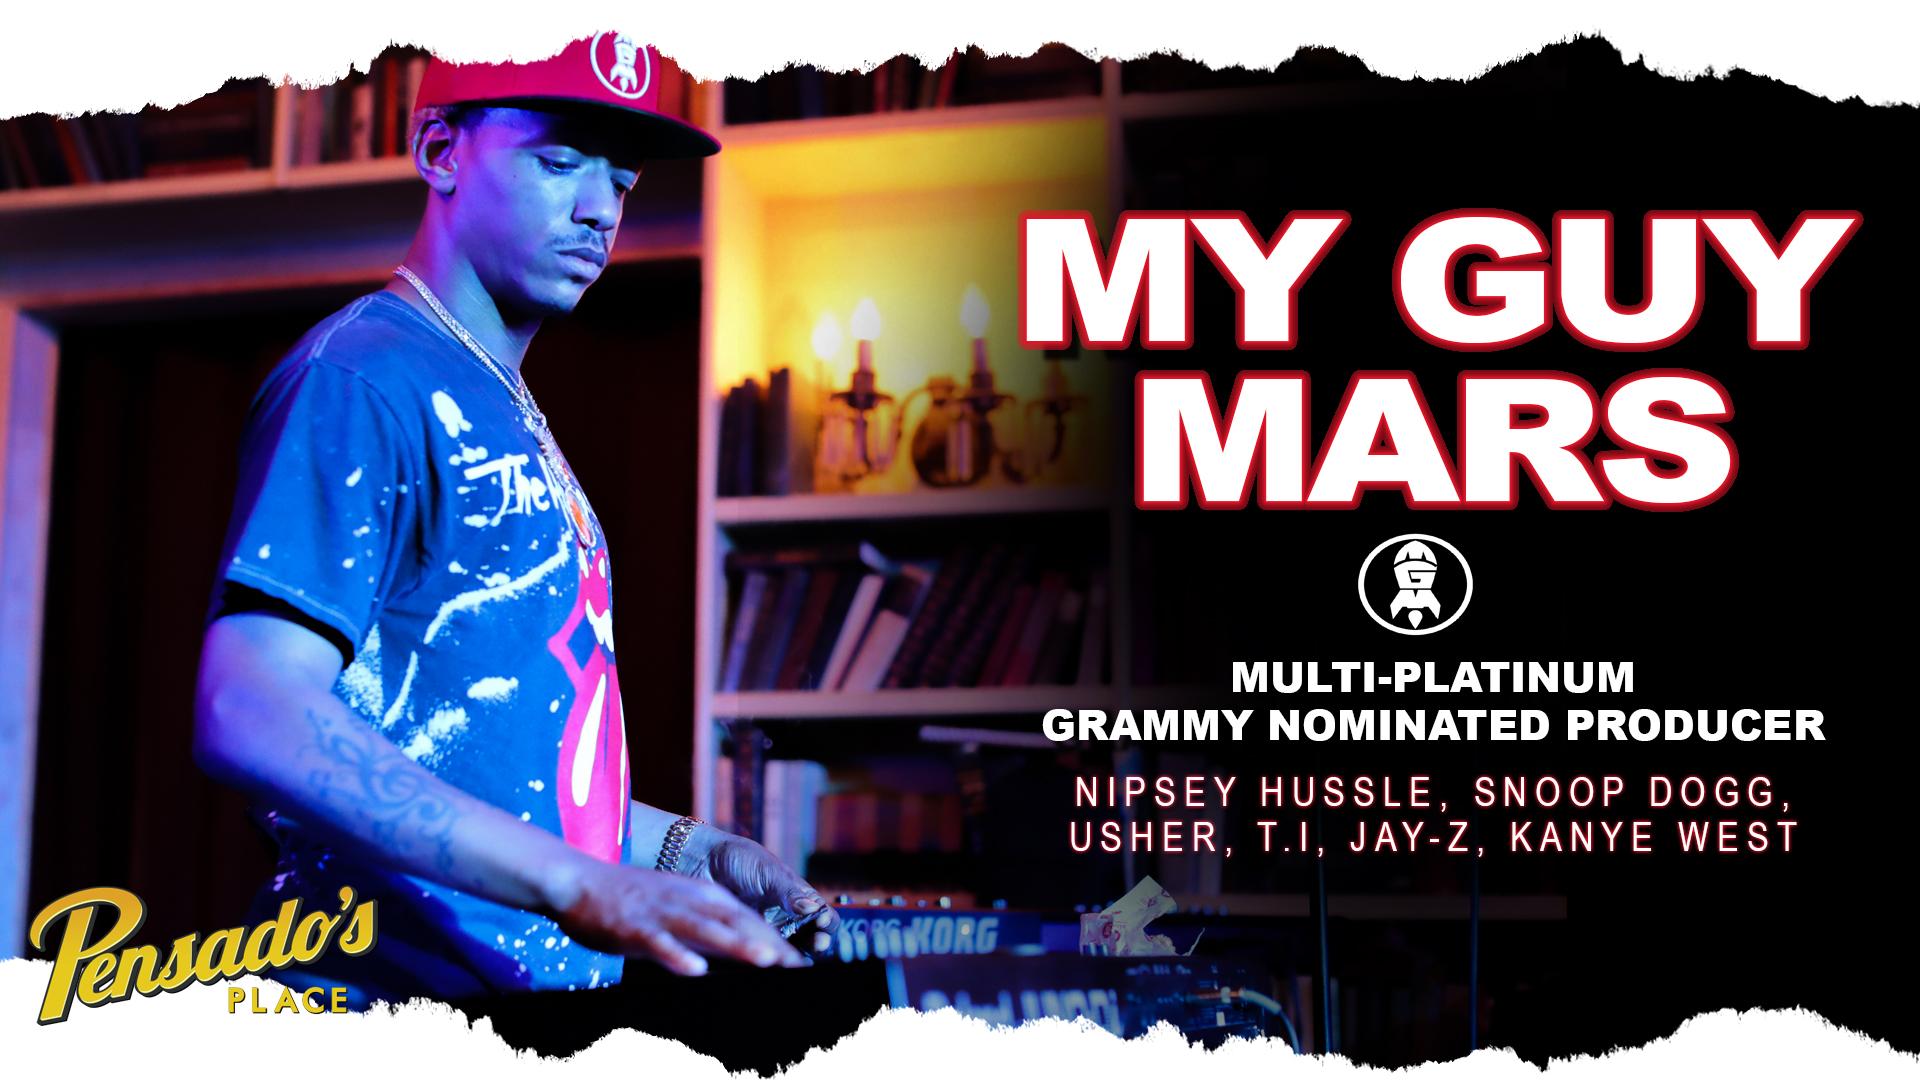 Multi-Platinum Grammy Nominated Producer, My Guy Mars